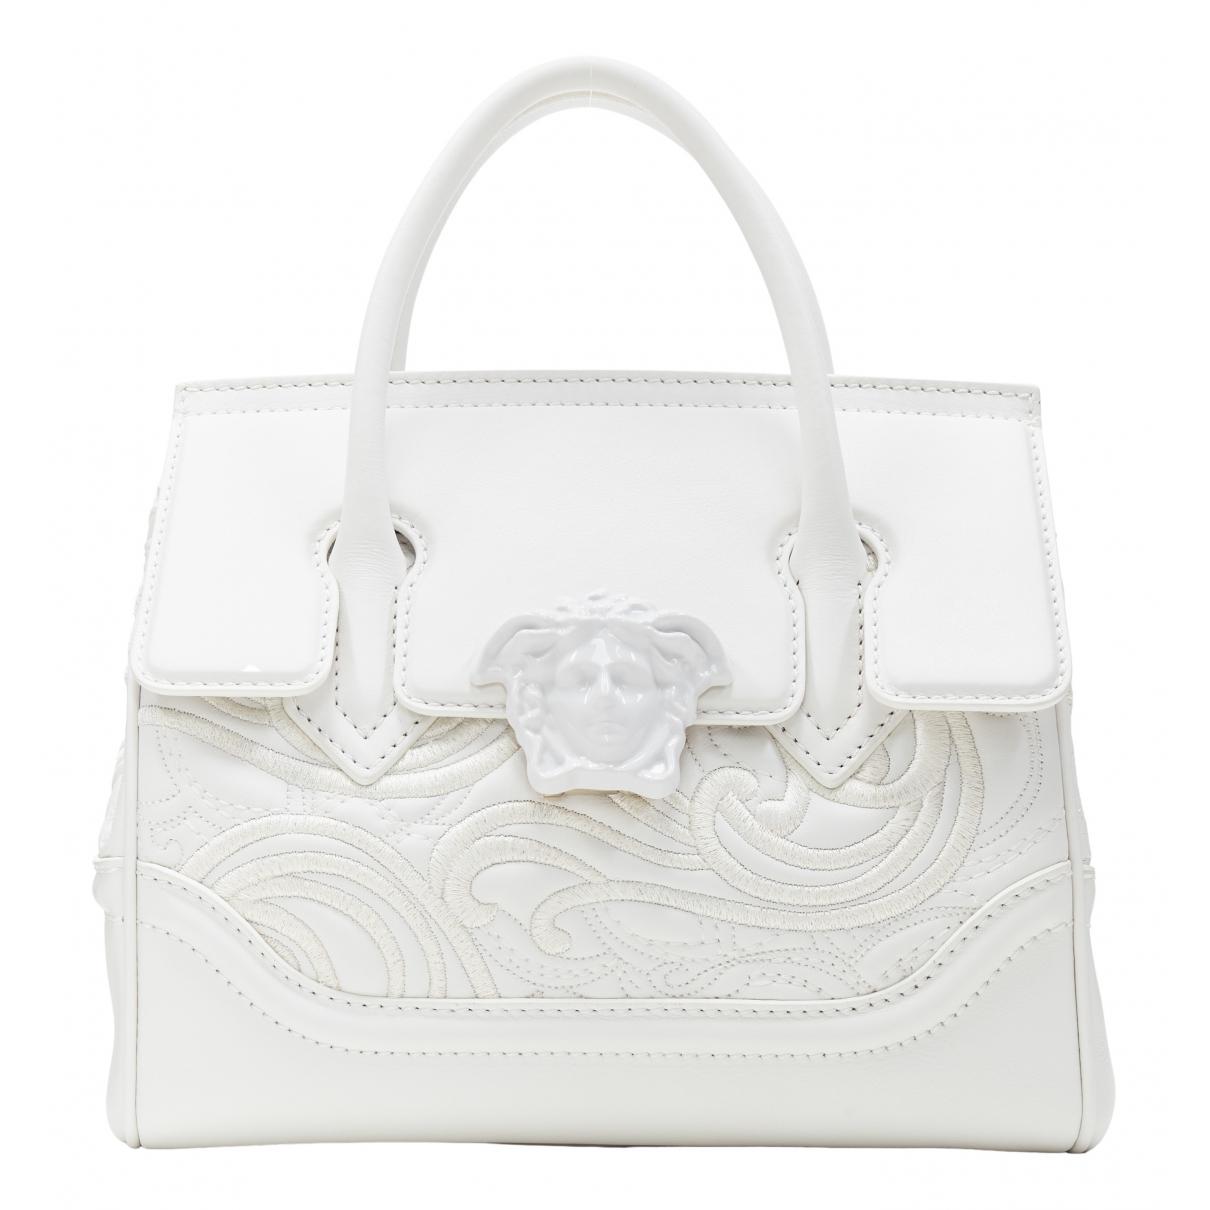 Versace - Sac a main Palazzo Empire pour femme en cuir - blanc